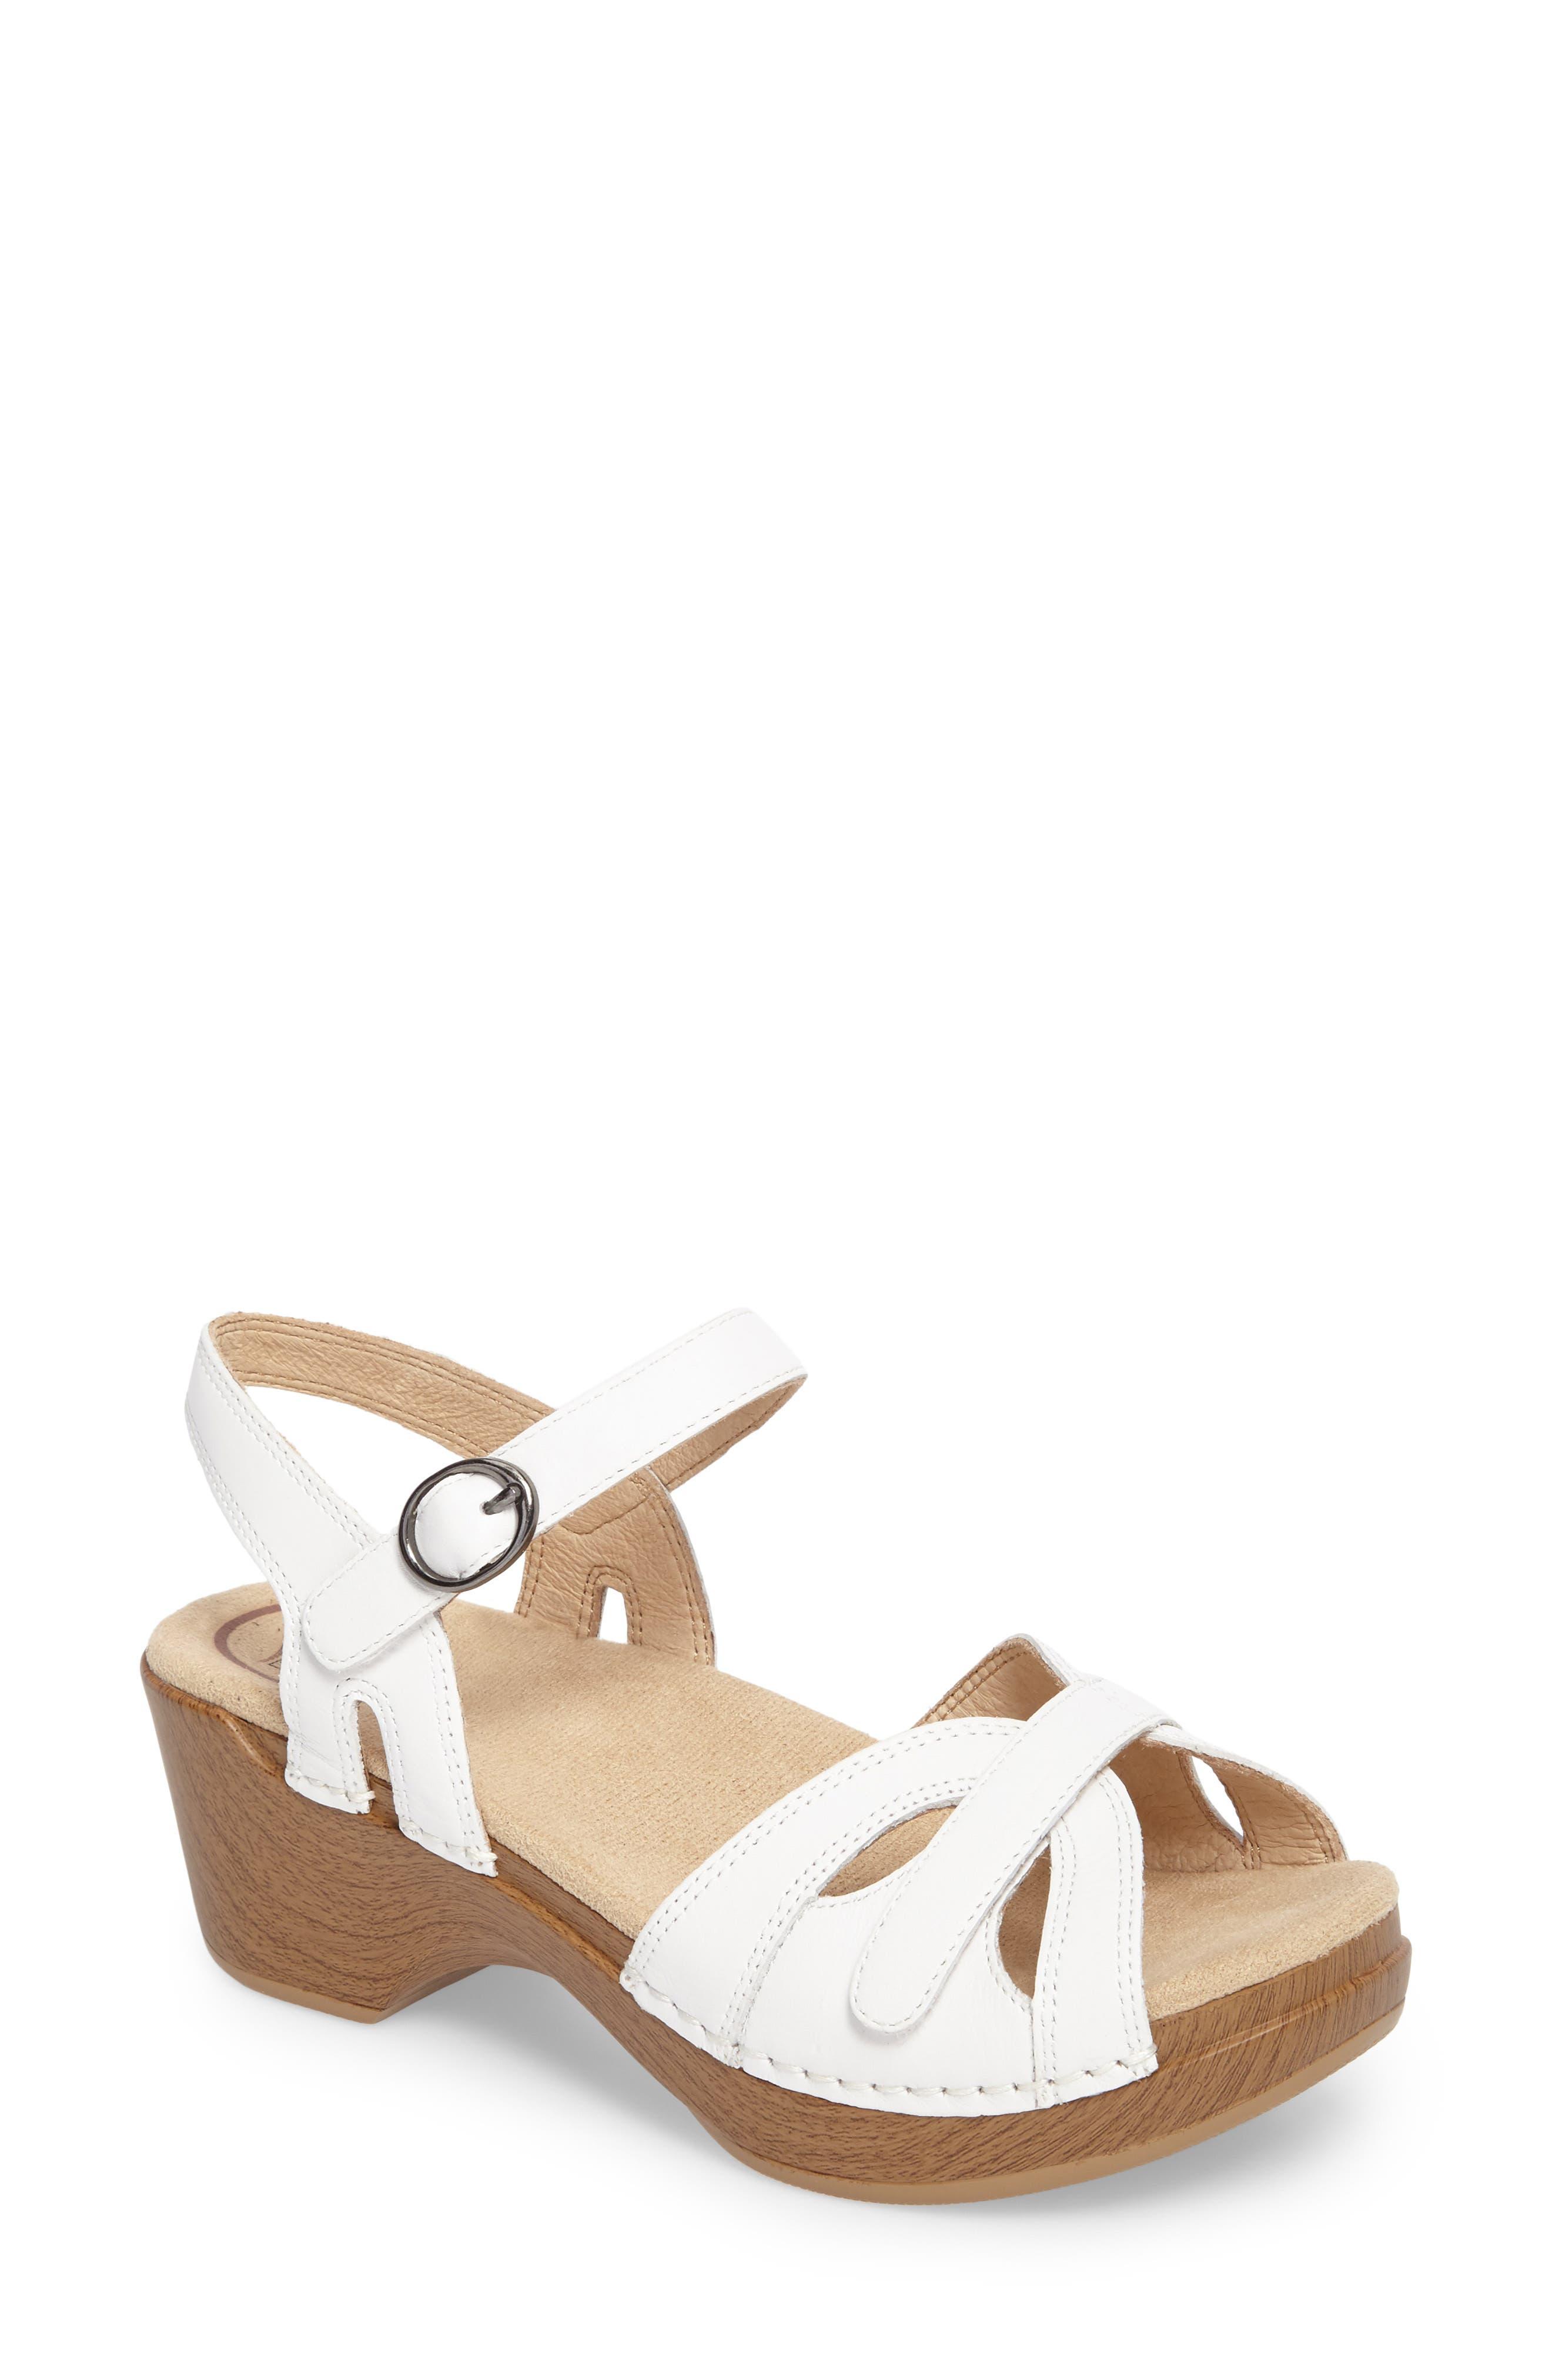 DANSKO Season Sandal, Main, color, WHITE LEATHER